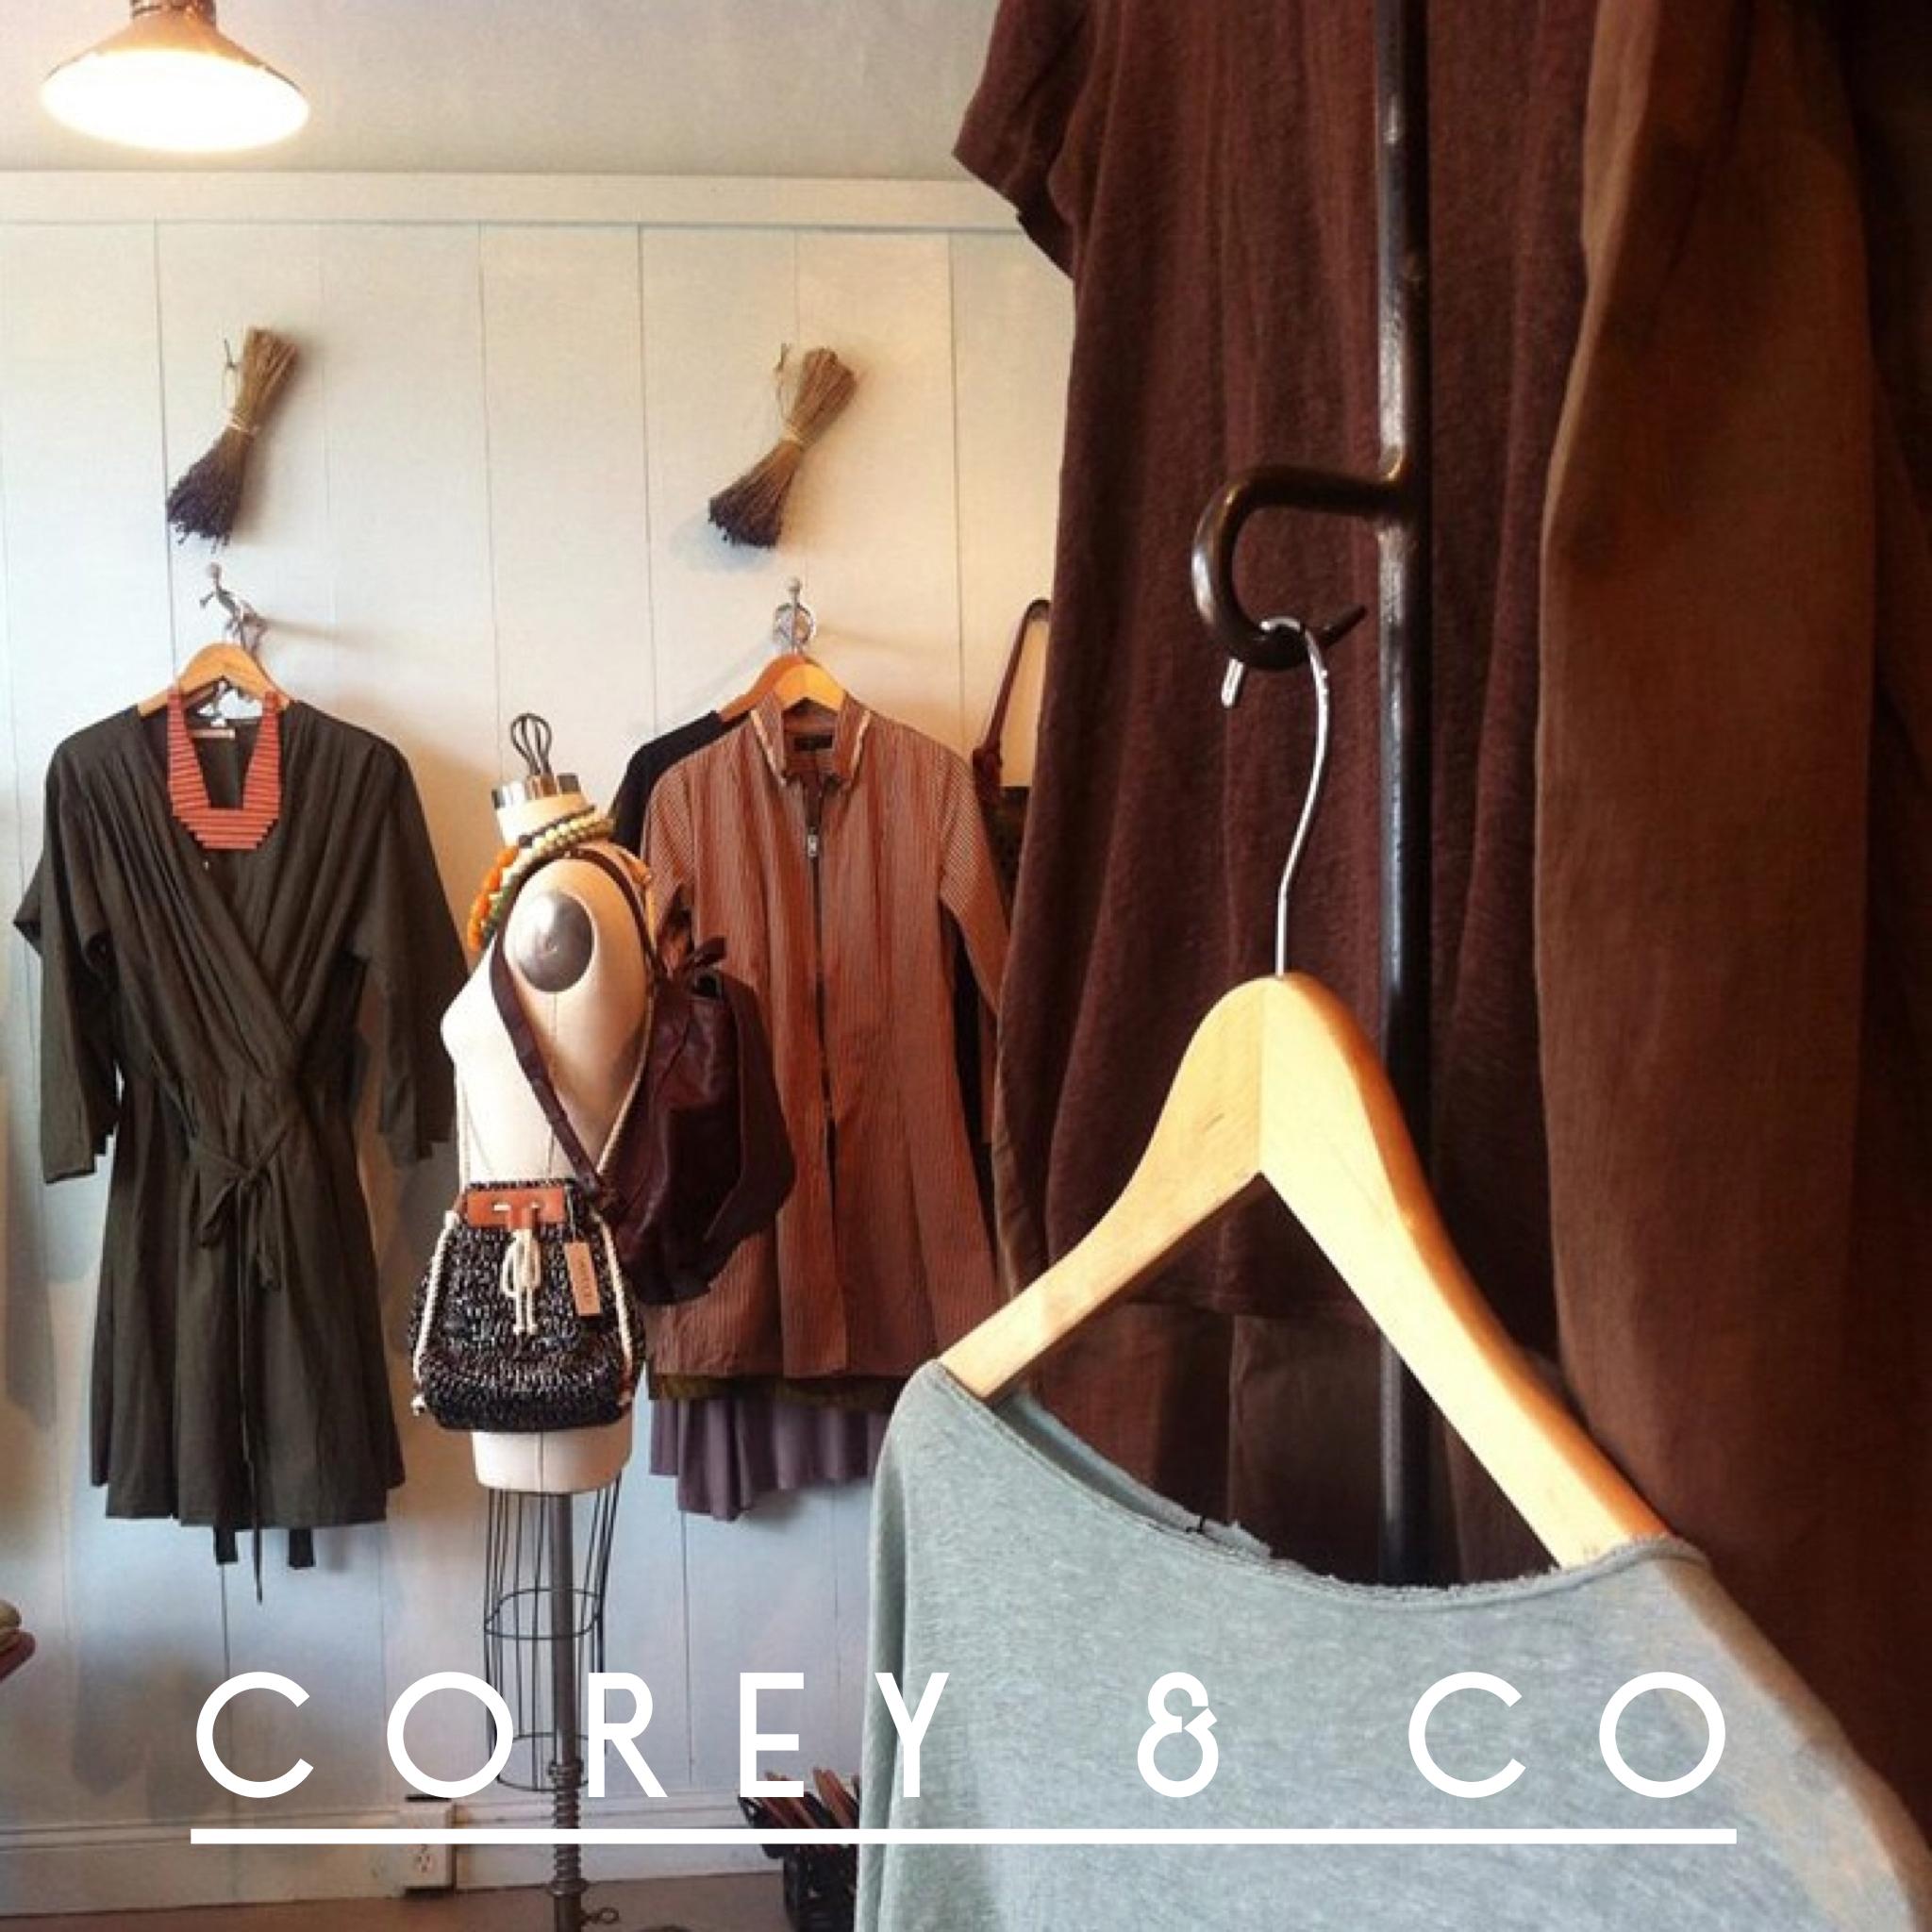 Corey & Co Portland, Maine